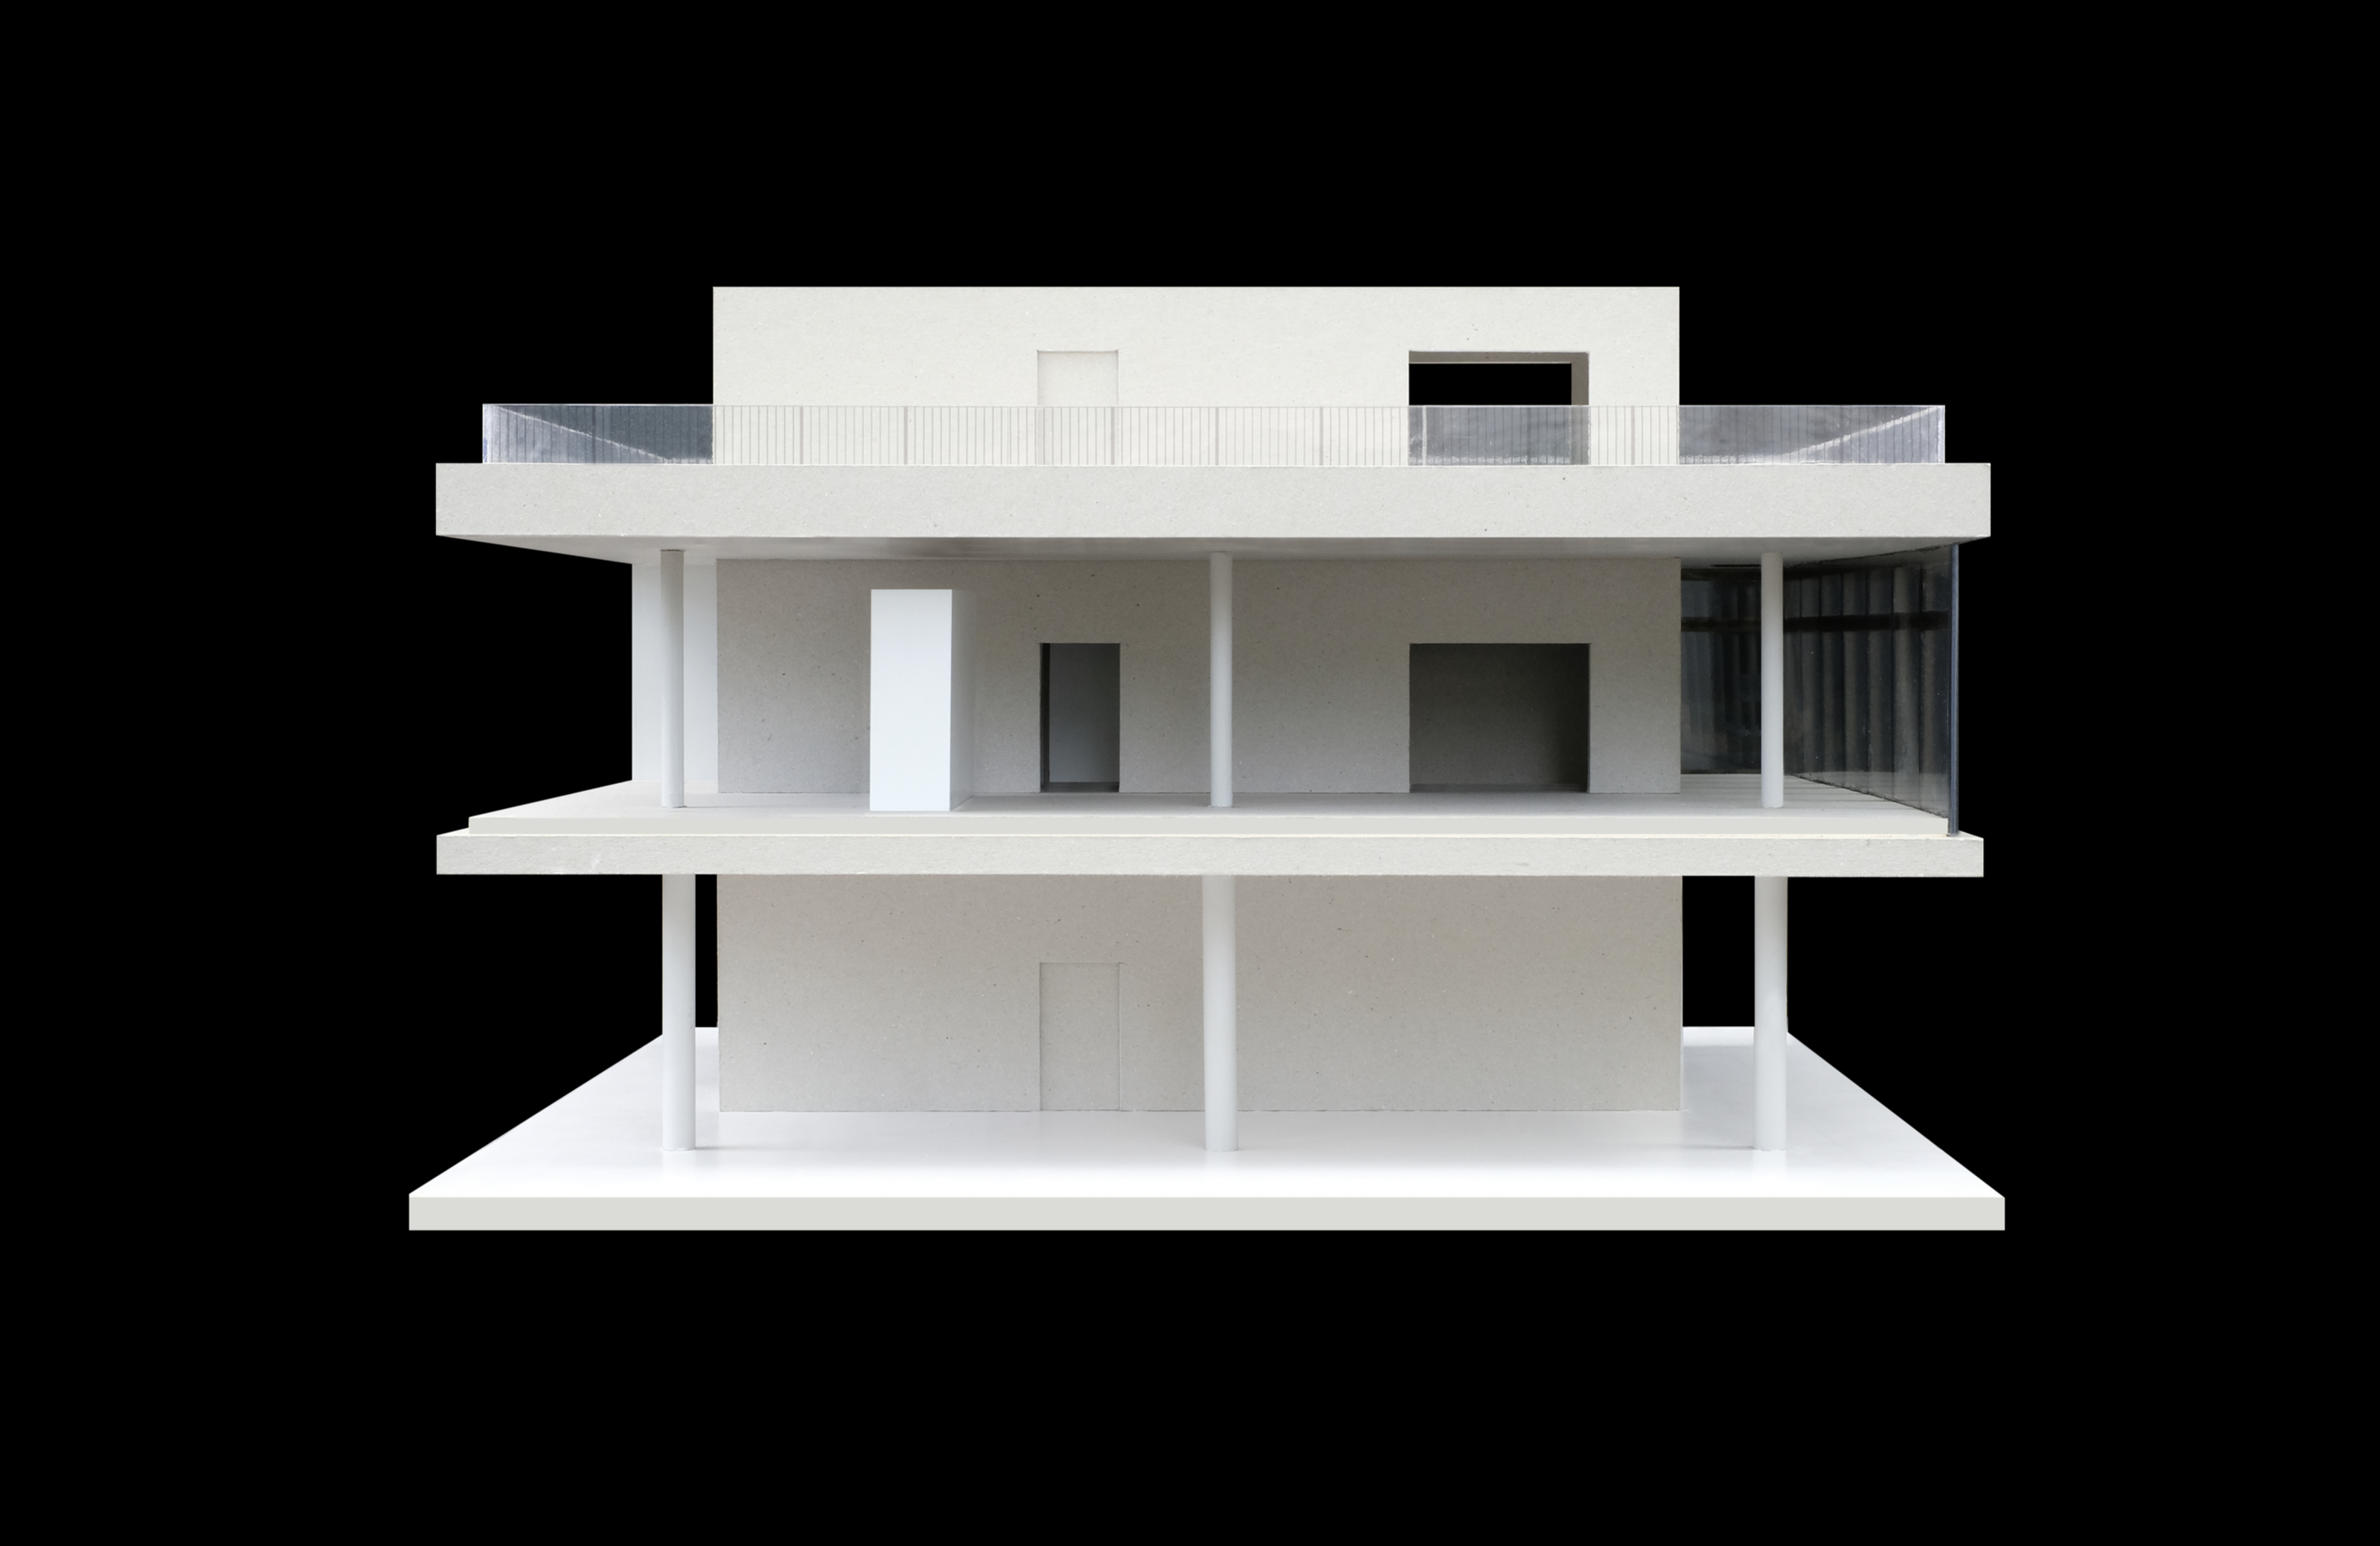 Haus an der Spree Modell